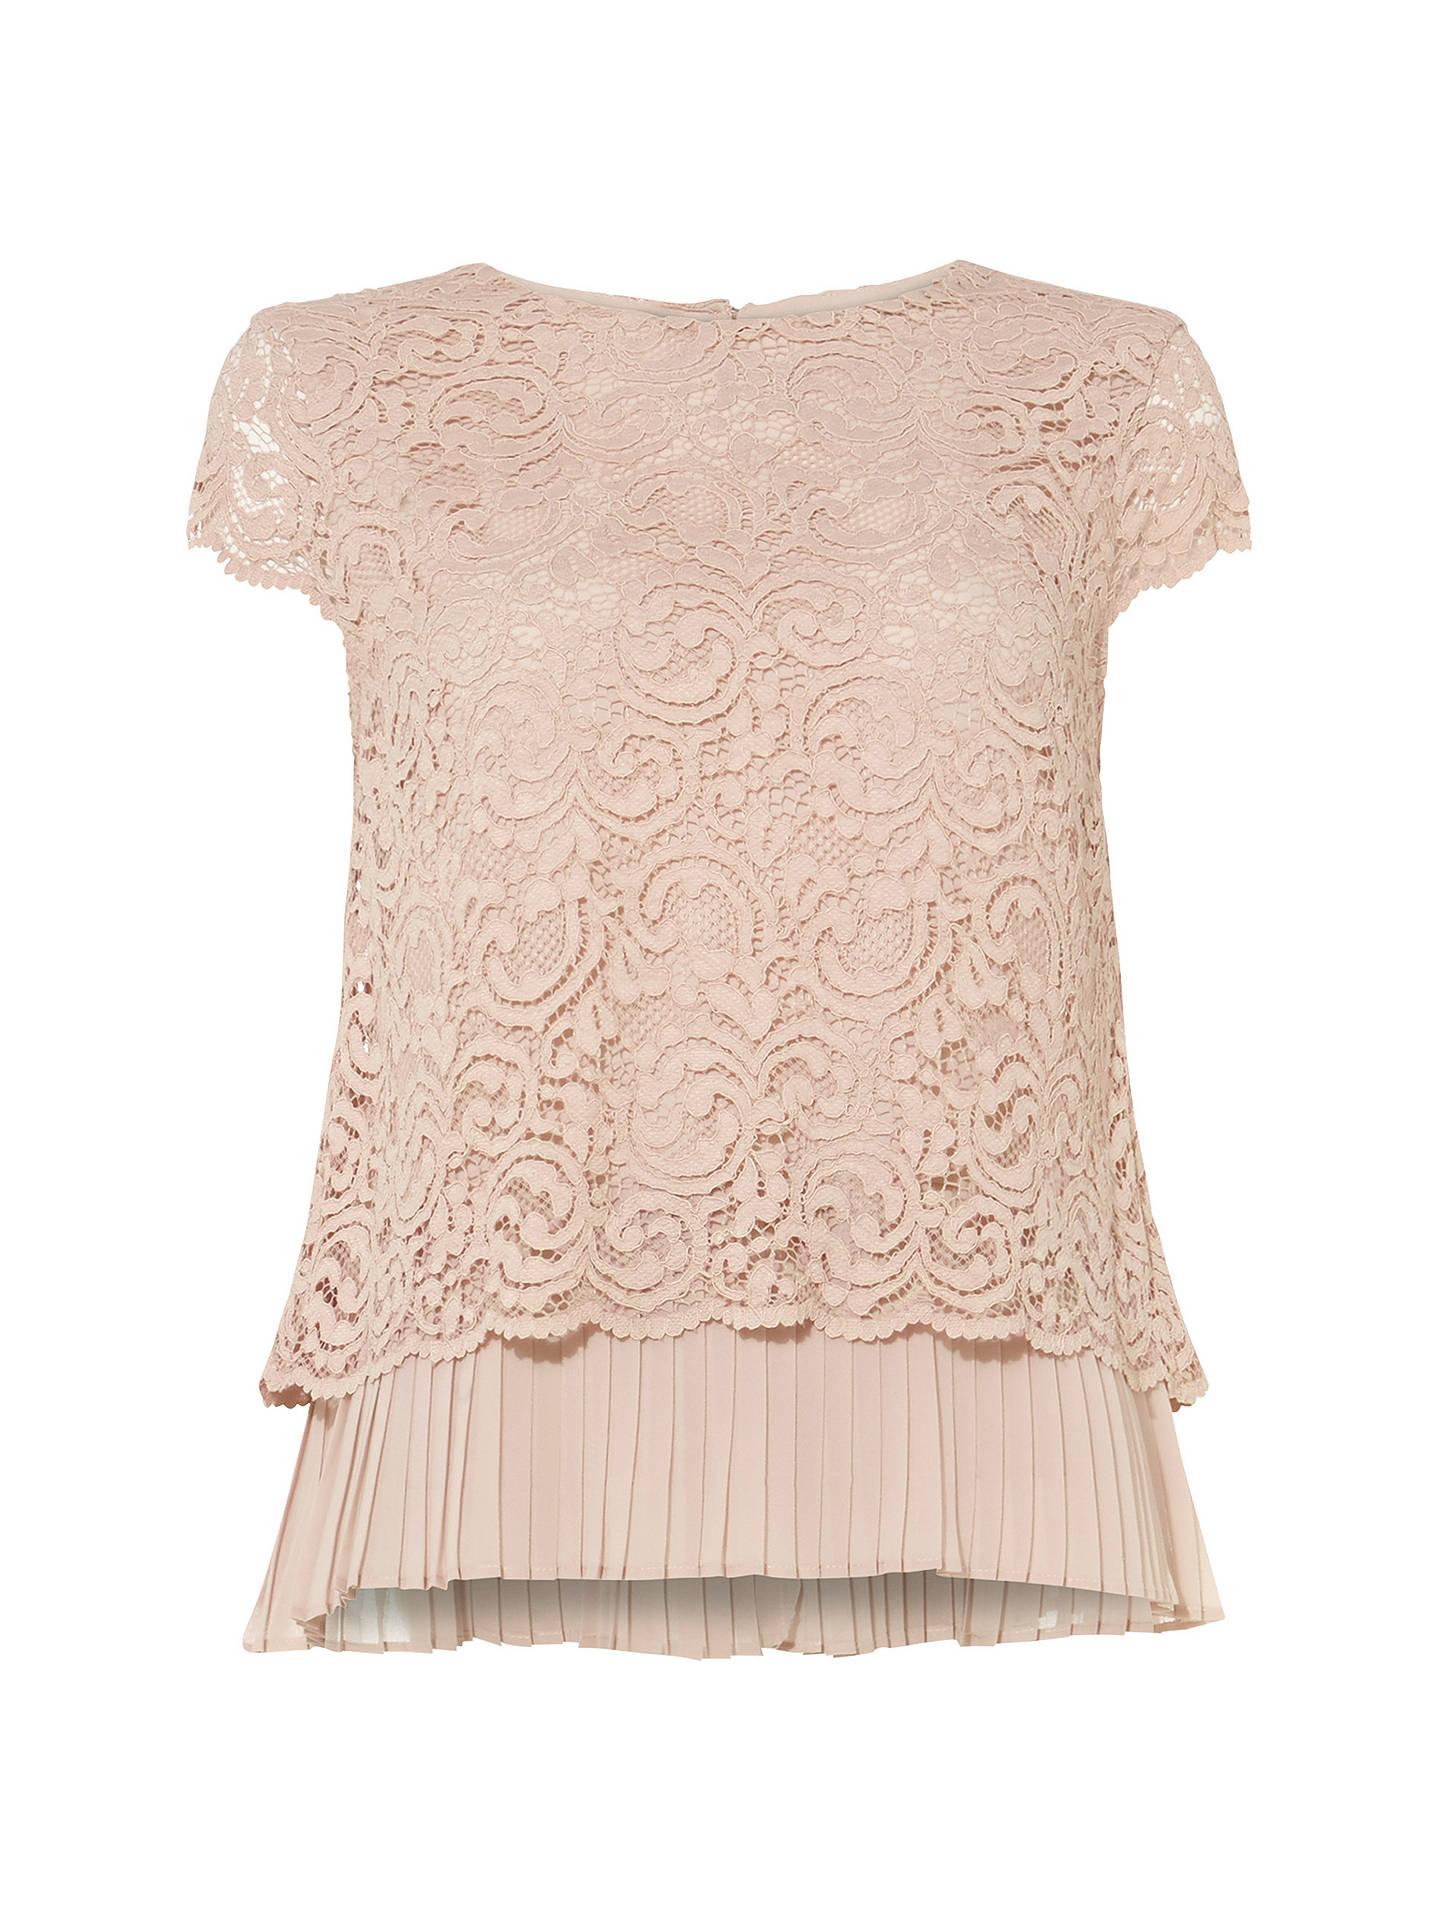 c0dabca3aca623 Buy Phase Eight Lexie Lace Blouse, Blush, 8 Online at johnlewis.com ...